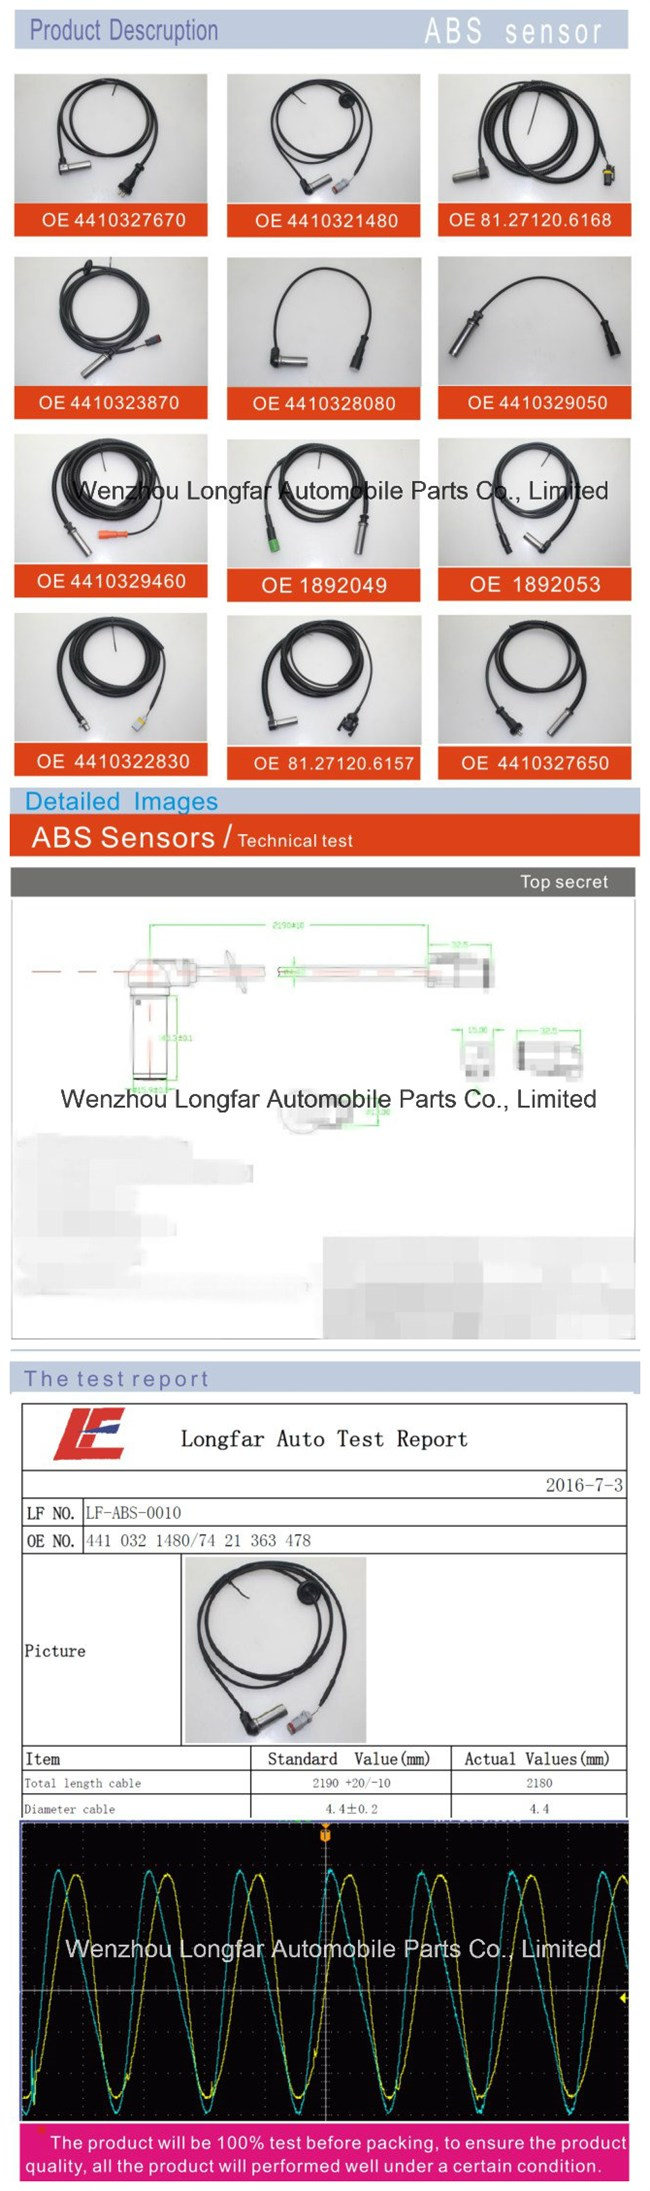 Auto Crankshaft Position Sensor Engine Speed Transducer Indicator Sensor 12595966,PC830,213-3906,71-5327,Su9542 for GM,Chevrolet,Buick,Standard,Acdelco,Carques